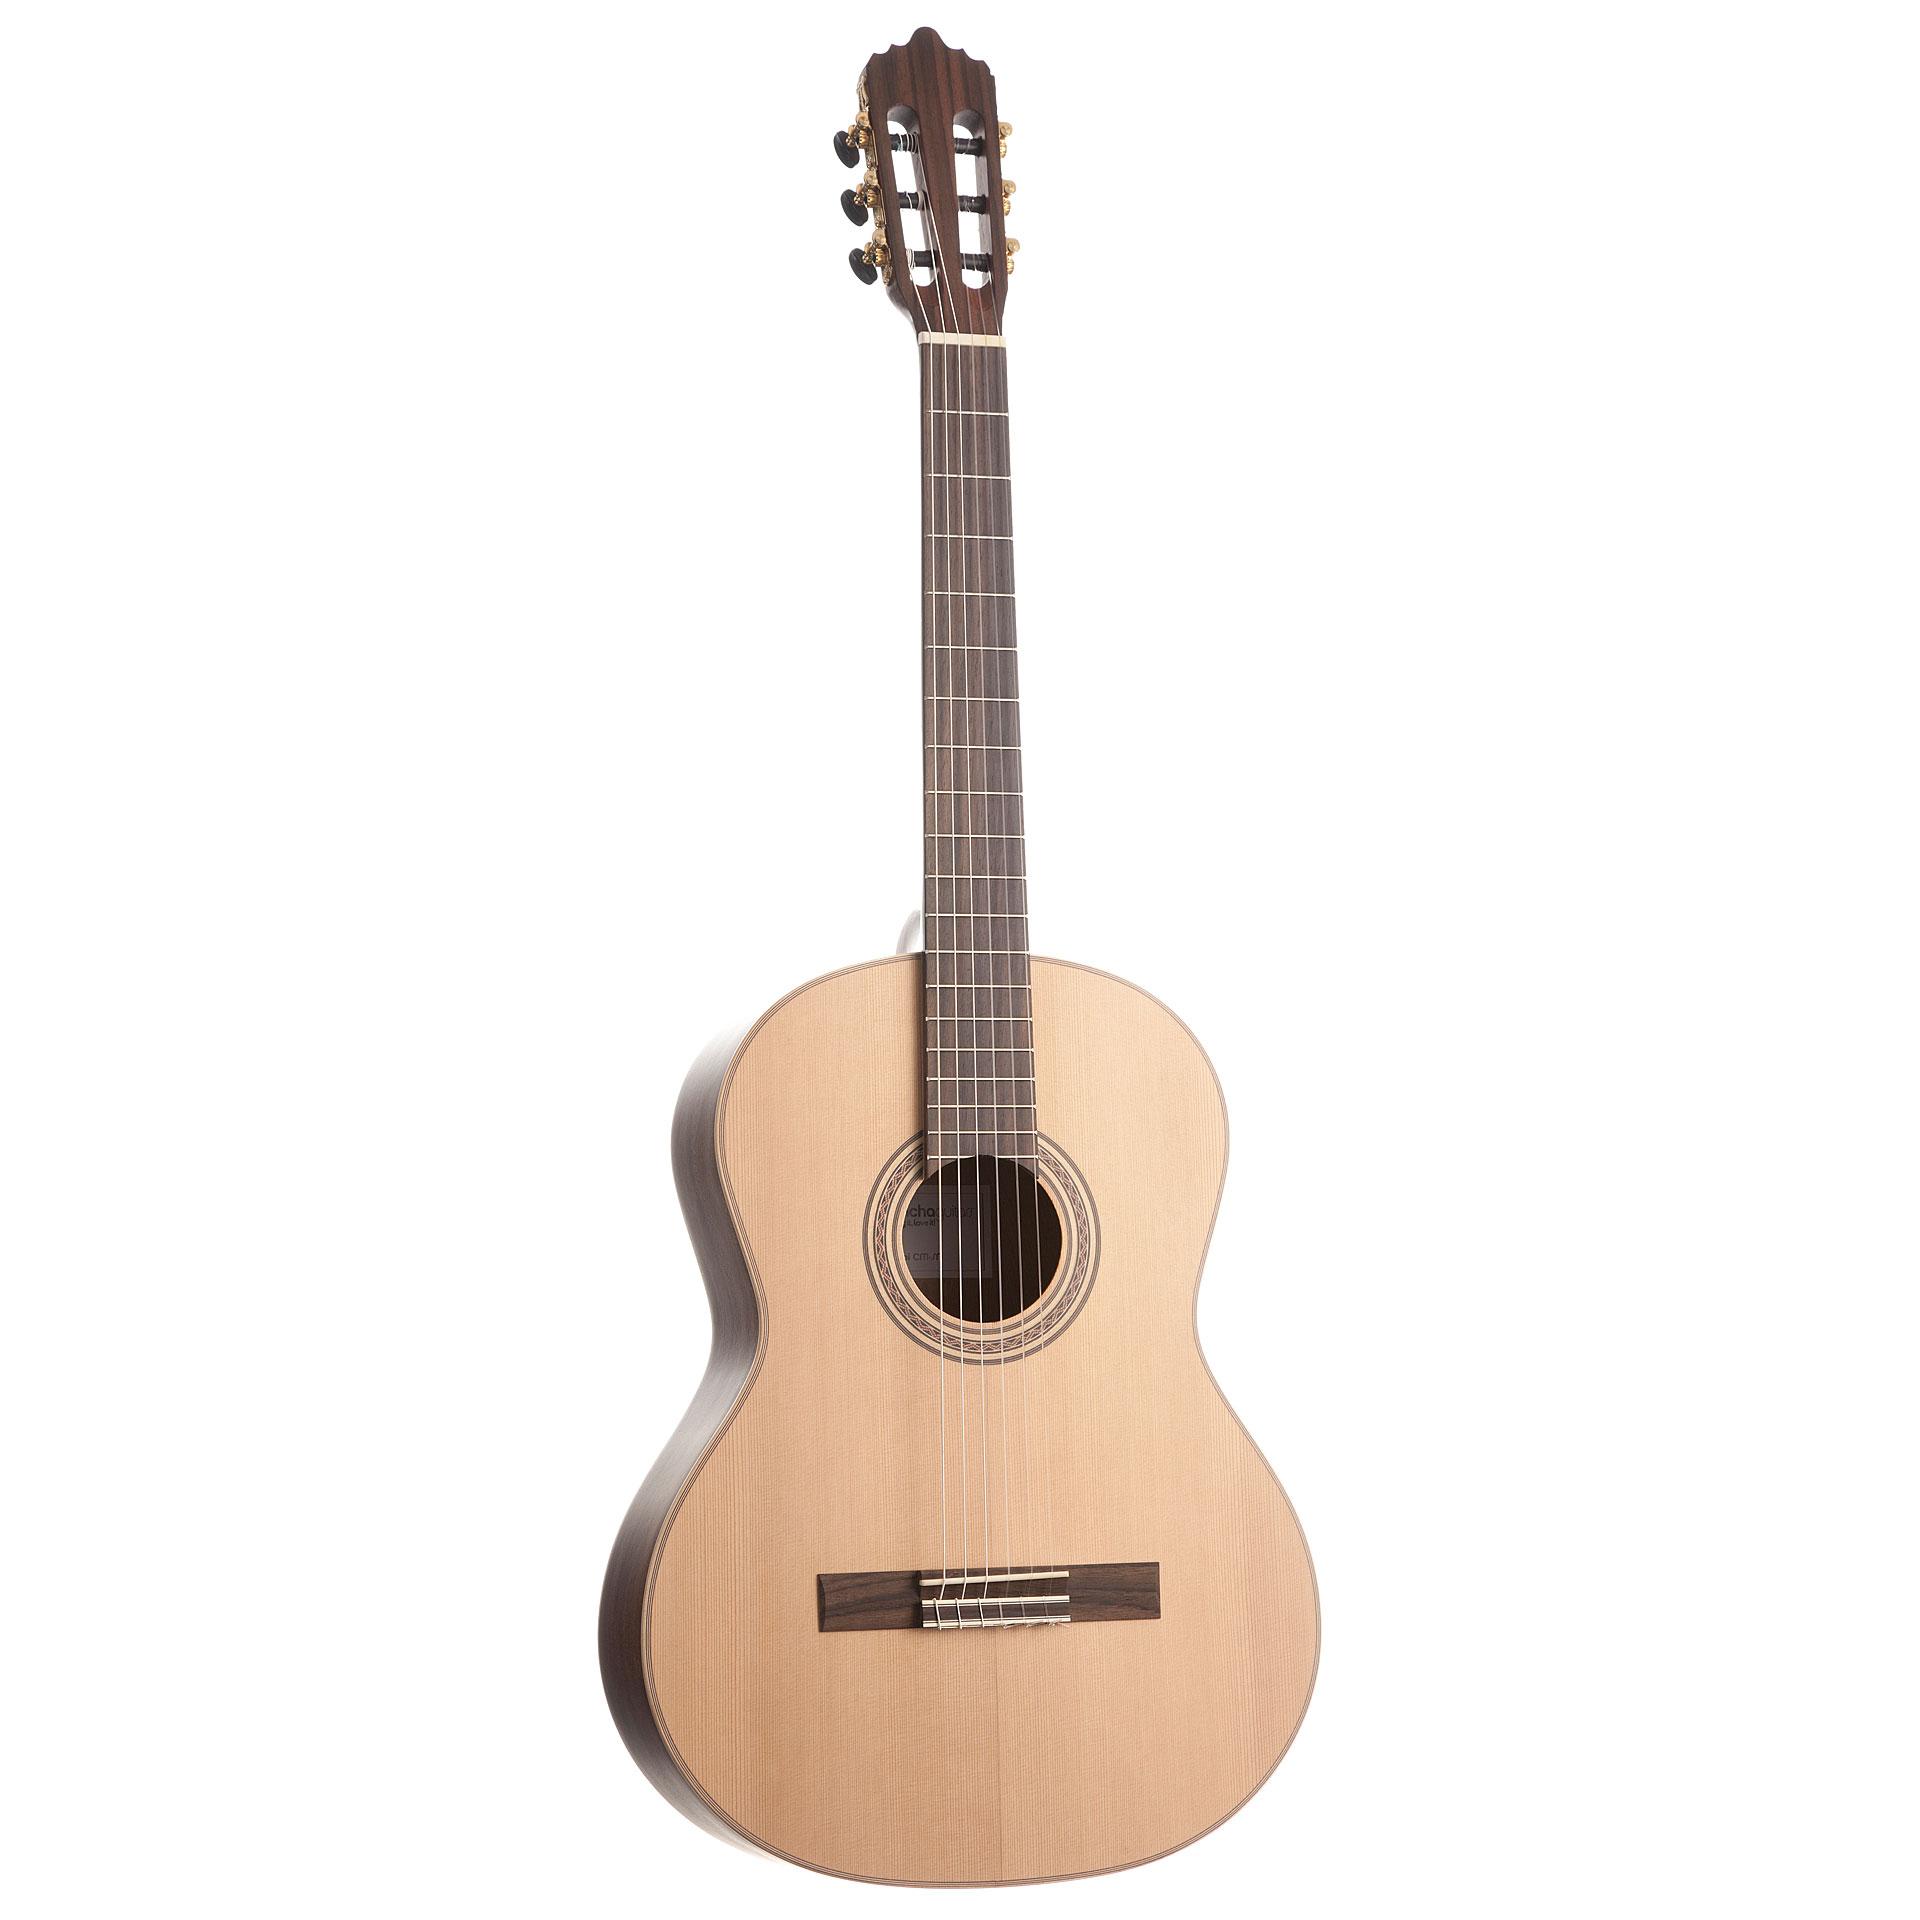 lamancha rubi cm sn small neck classical guitar. Black Bedroom Furniture Sets. Home Design Ideas